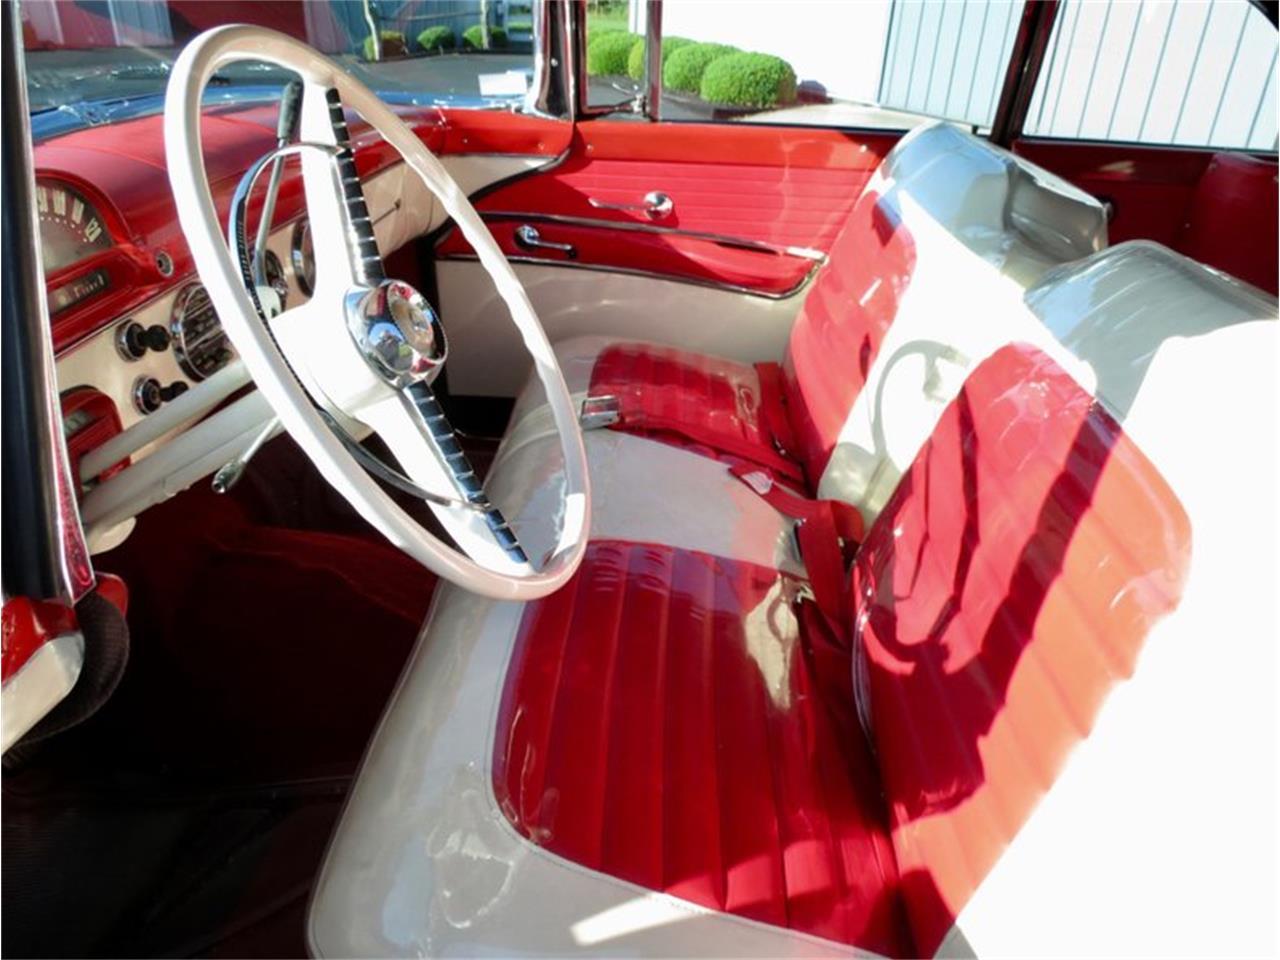 Large Picture of 1955 Ford Fairlane located in Ohio - $38,500.00 - QU8Q